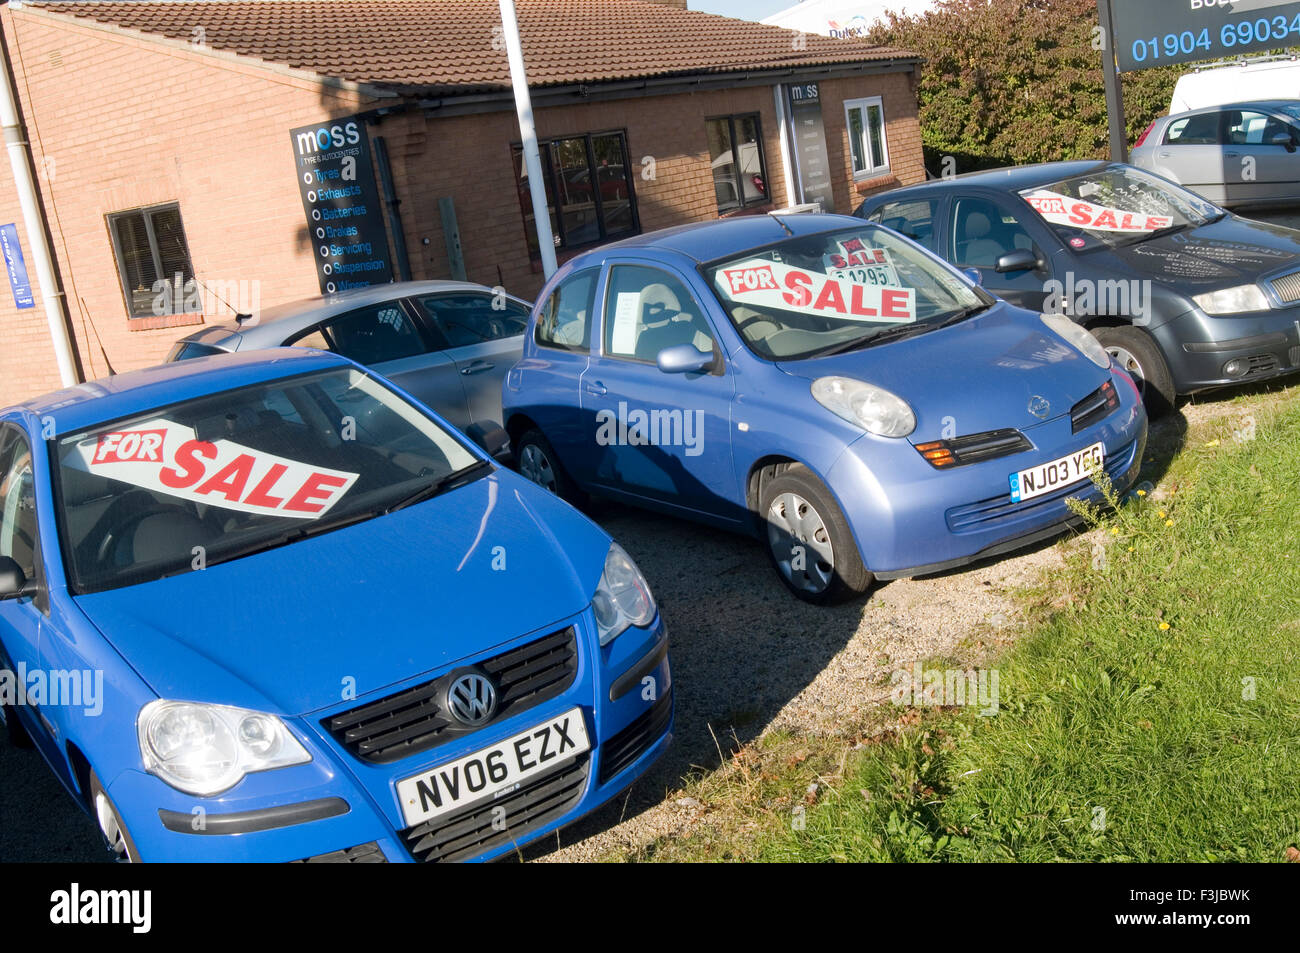 Cheap Car Lots >> Cheap Car Cars Second Hand Secondhand Dodgy Car Dealers Dealer